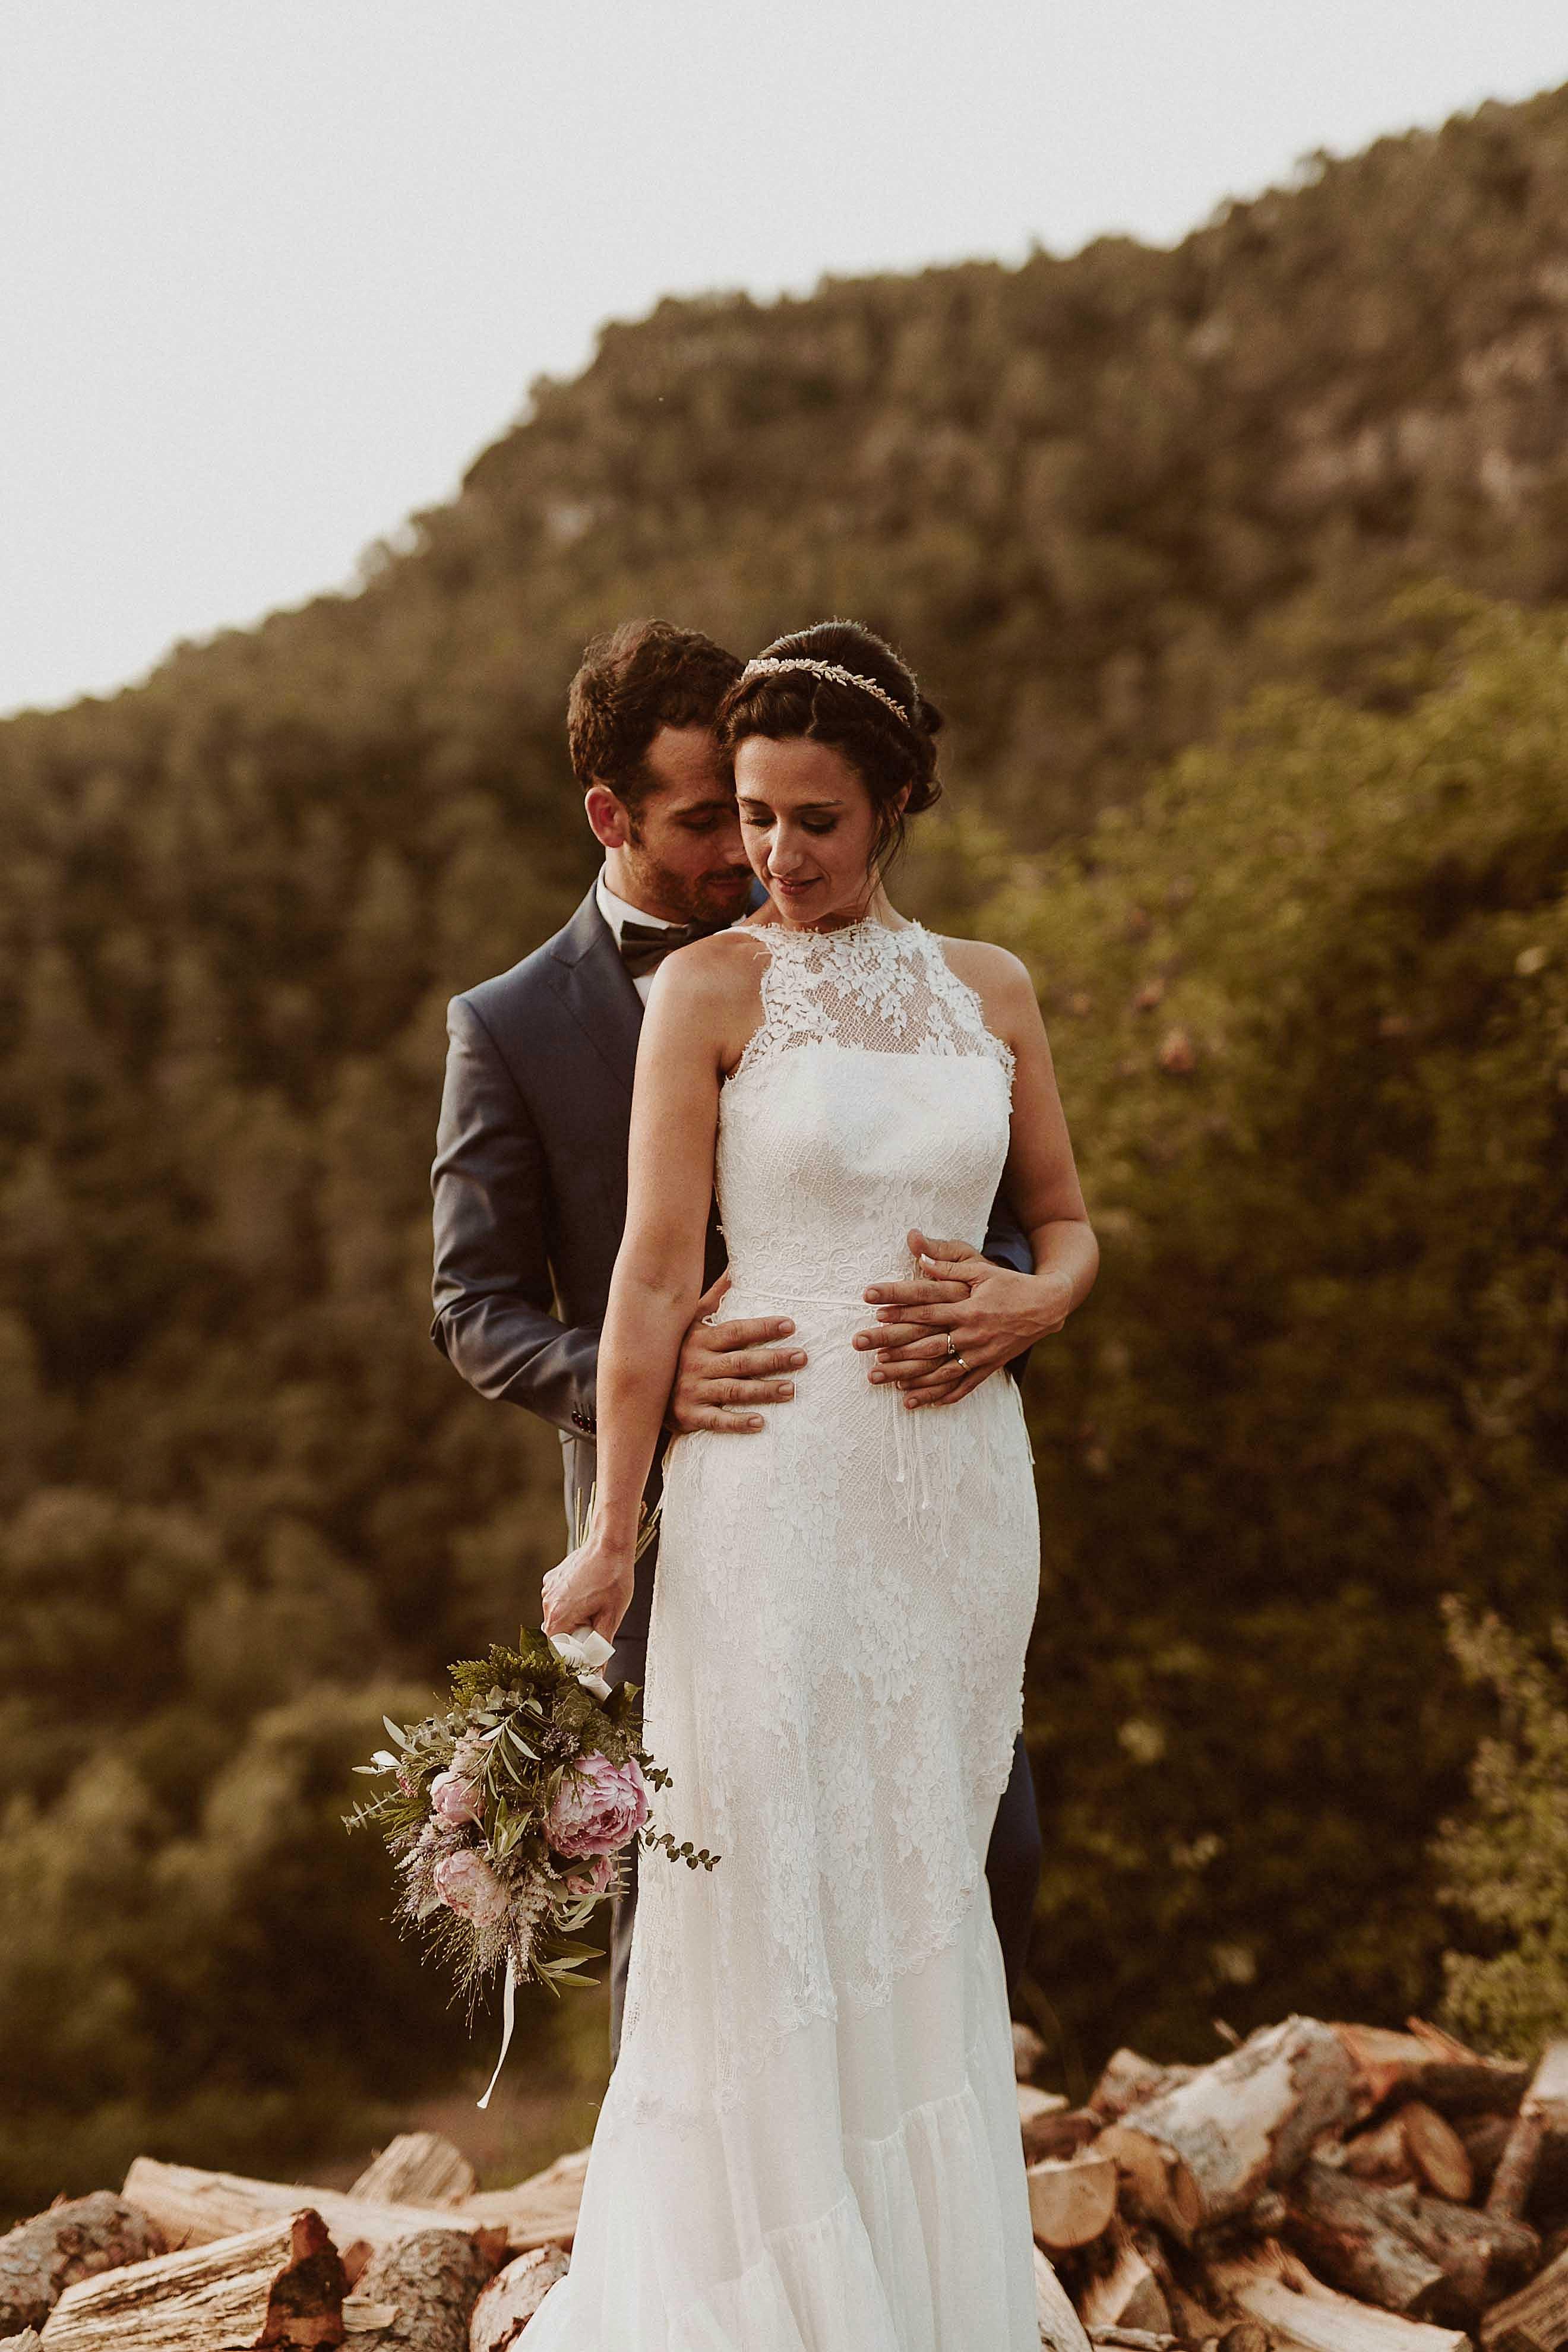 Boda rústica en la montaña. fotgrafo de bodas barcelona_083